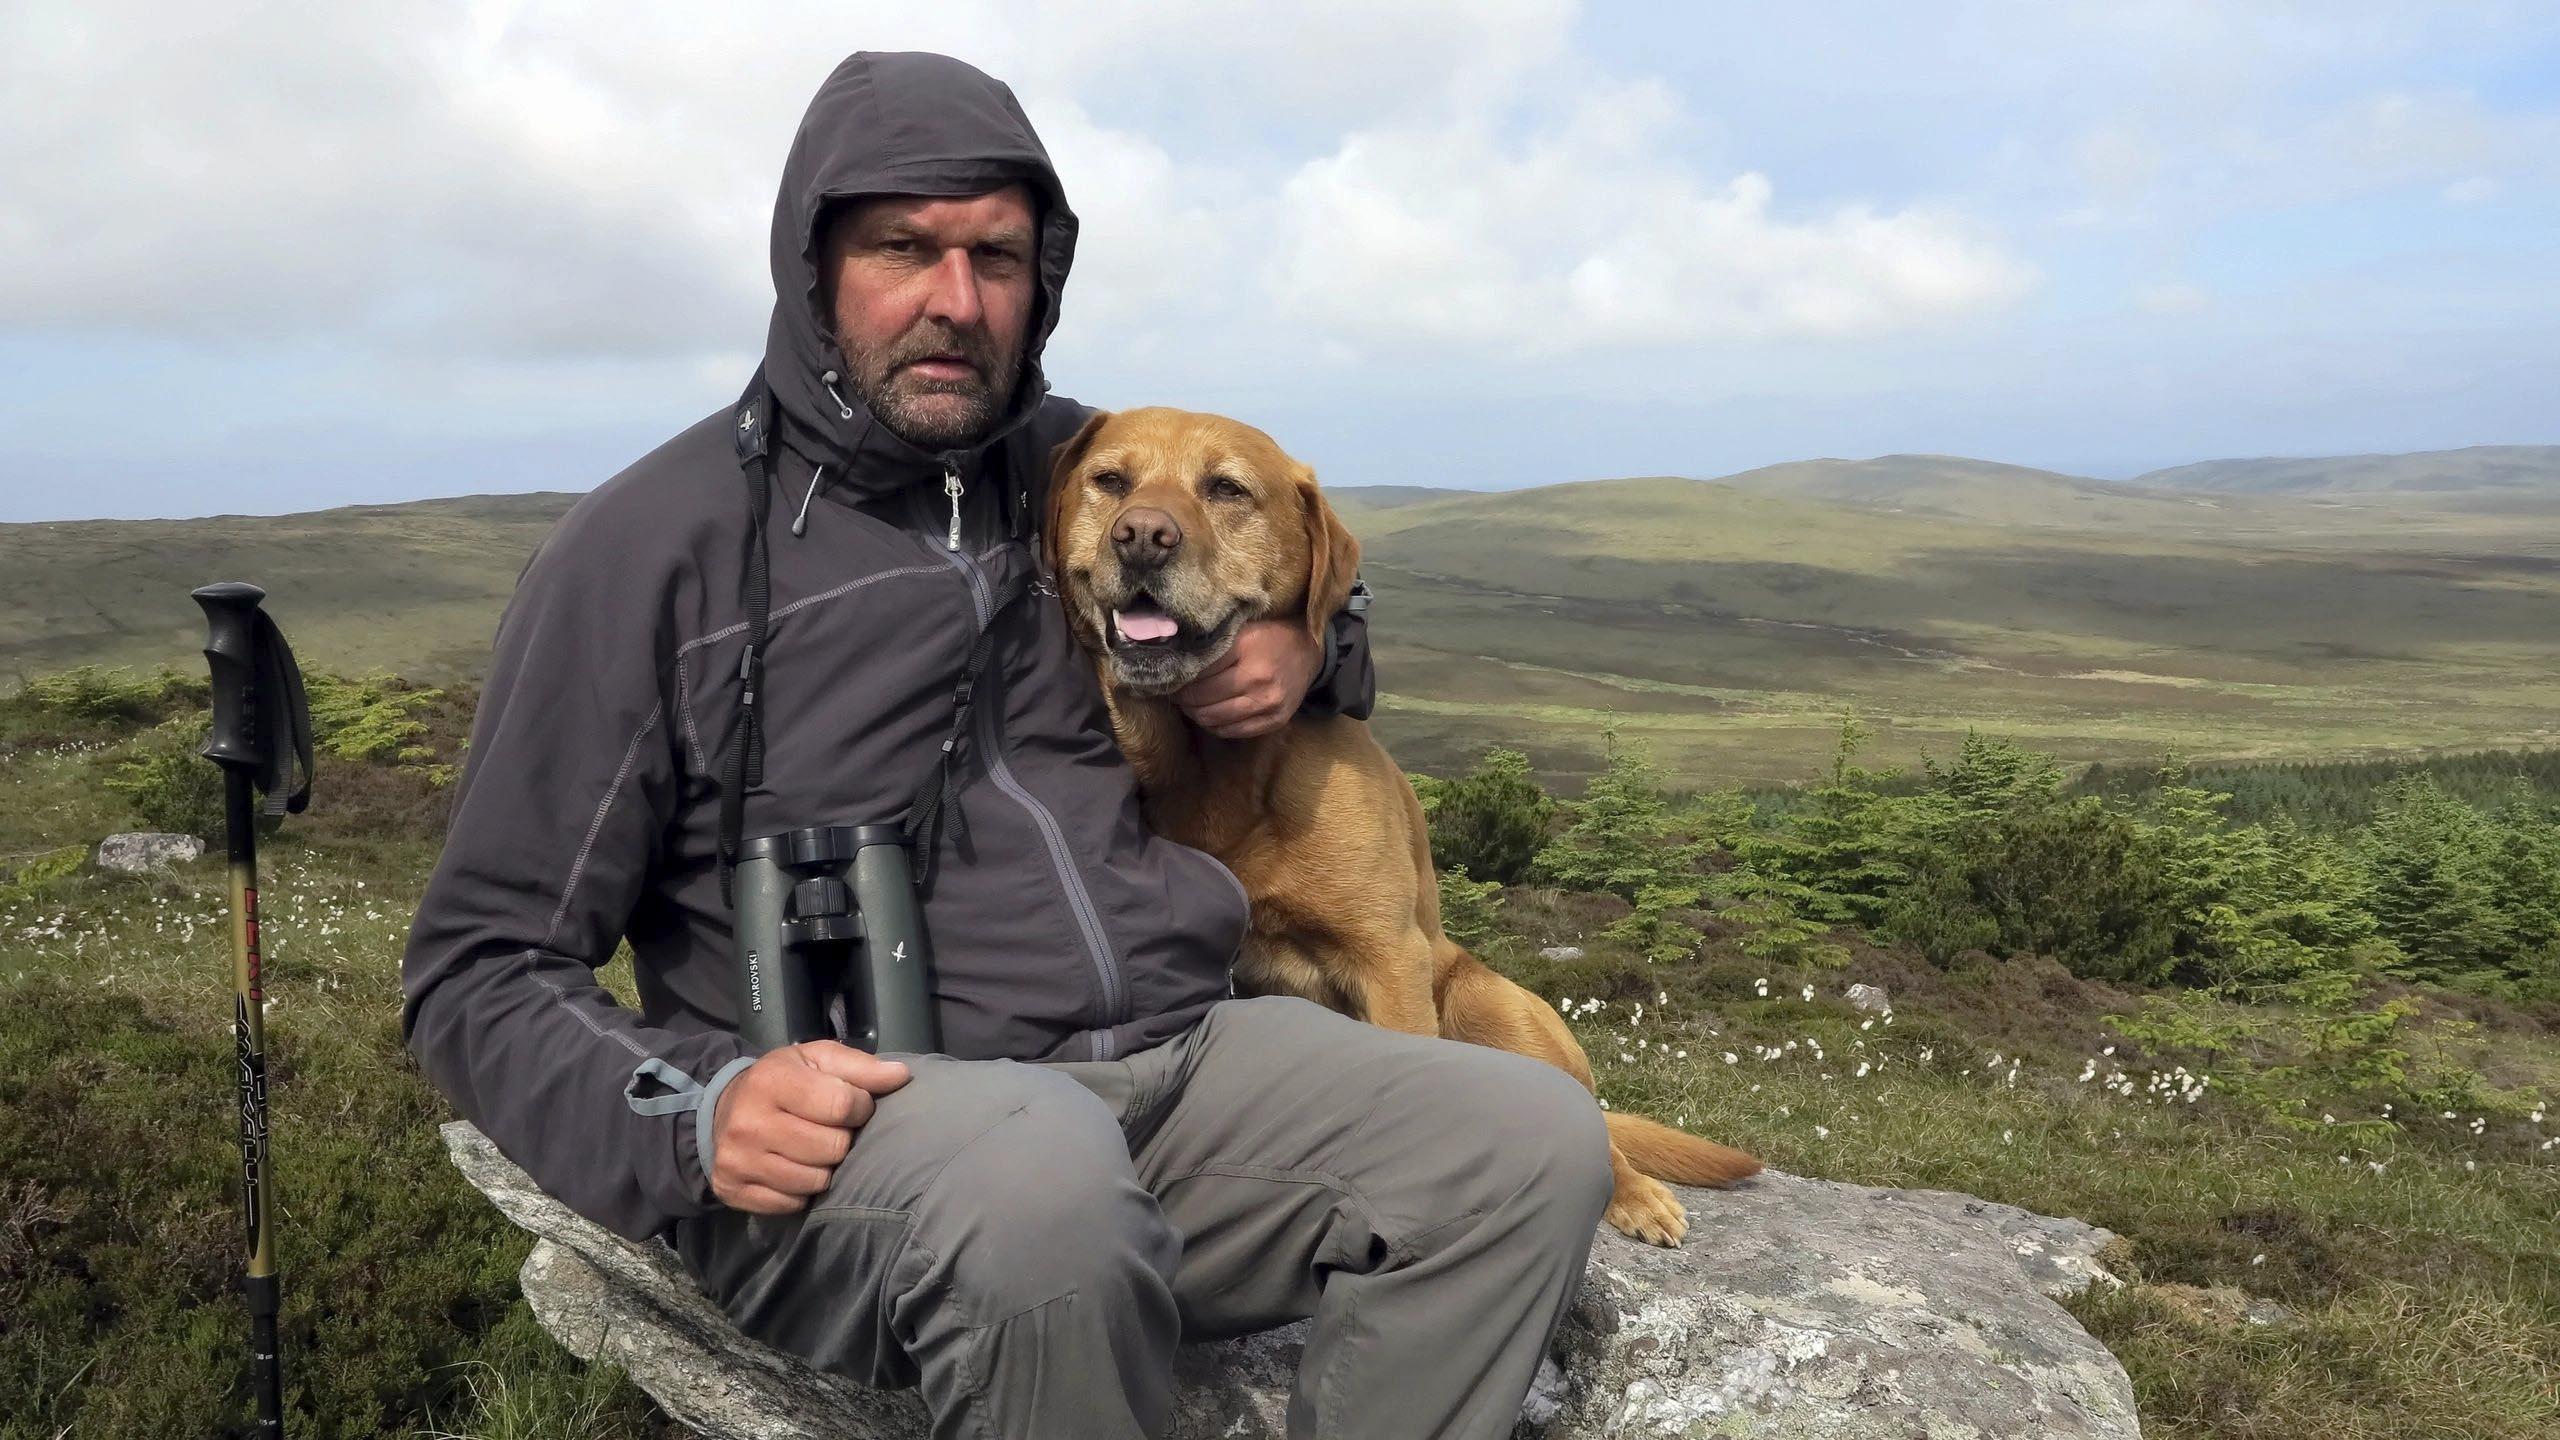 Wildlife Photographer Dean Eades